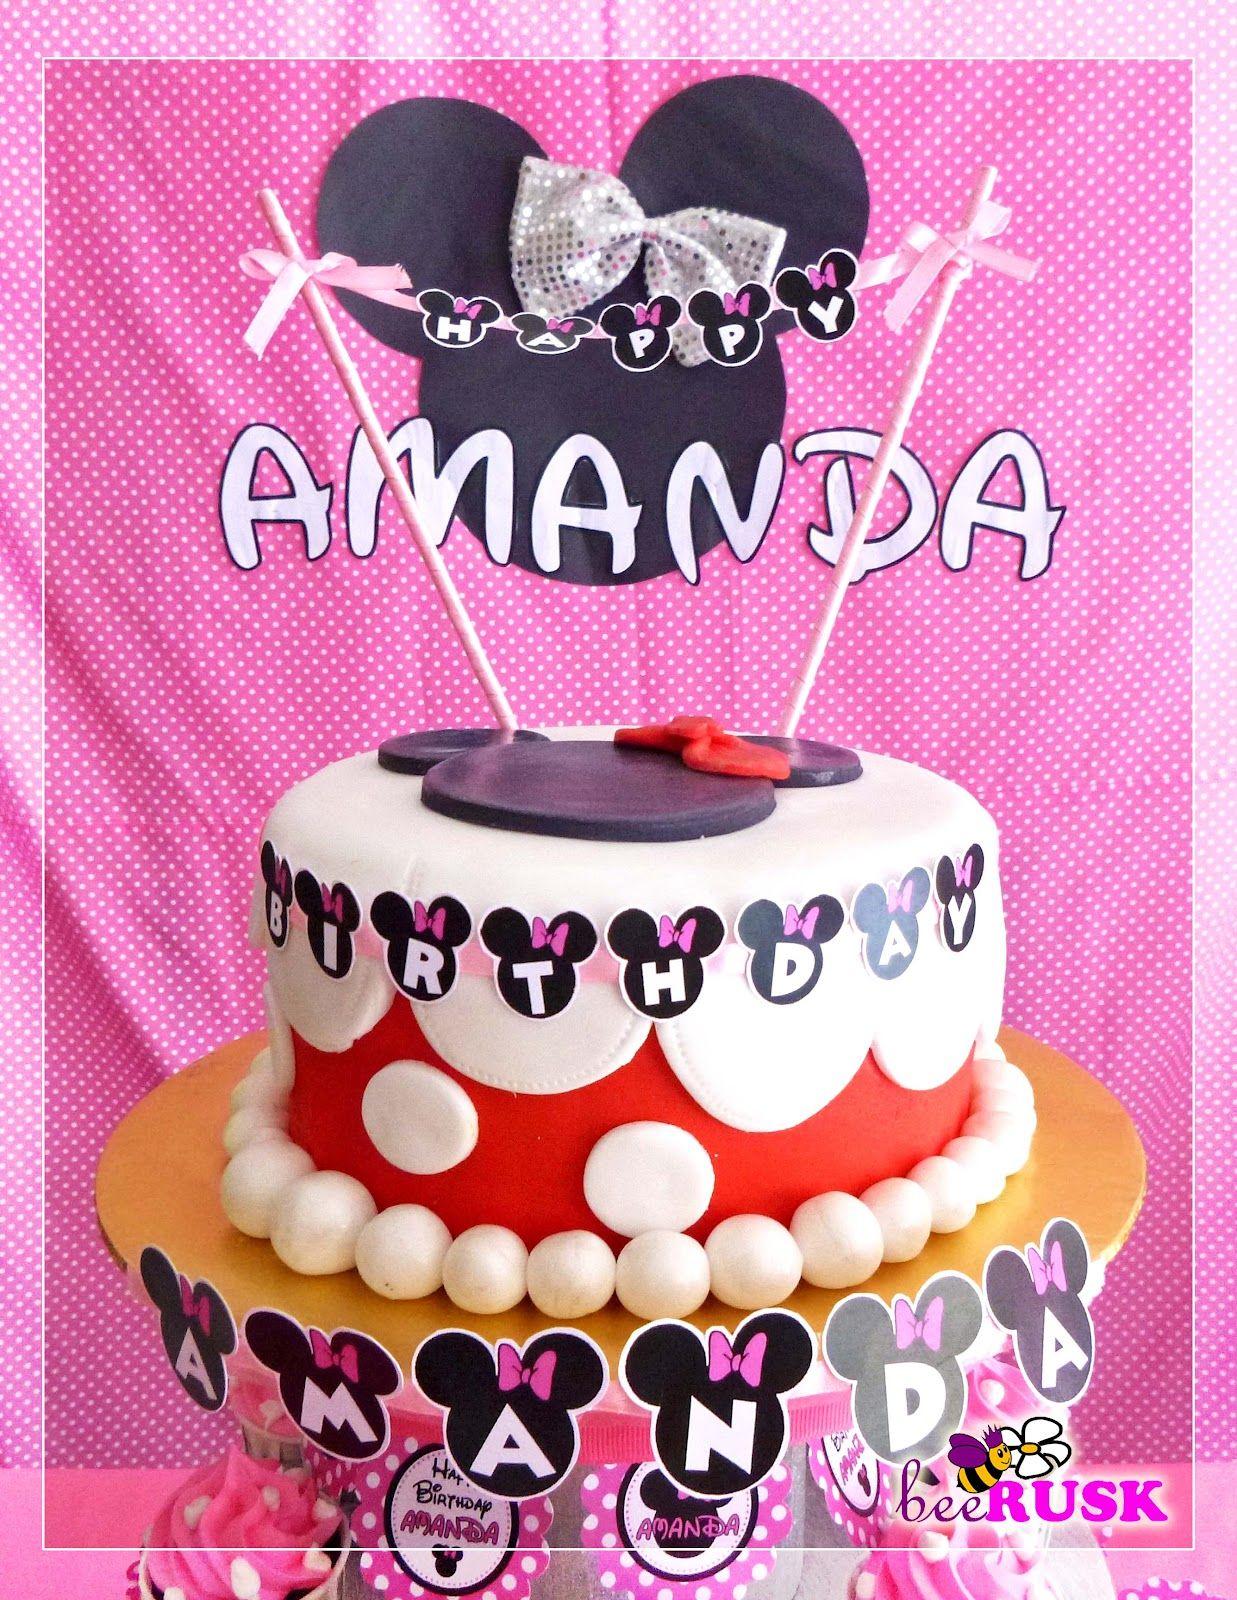 bc20654f4e57e27832a68984f701050b happy birthday amanda gorgeous birthday cake * happy birthday,Happy Birthday Amanda Meme